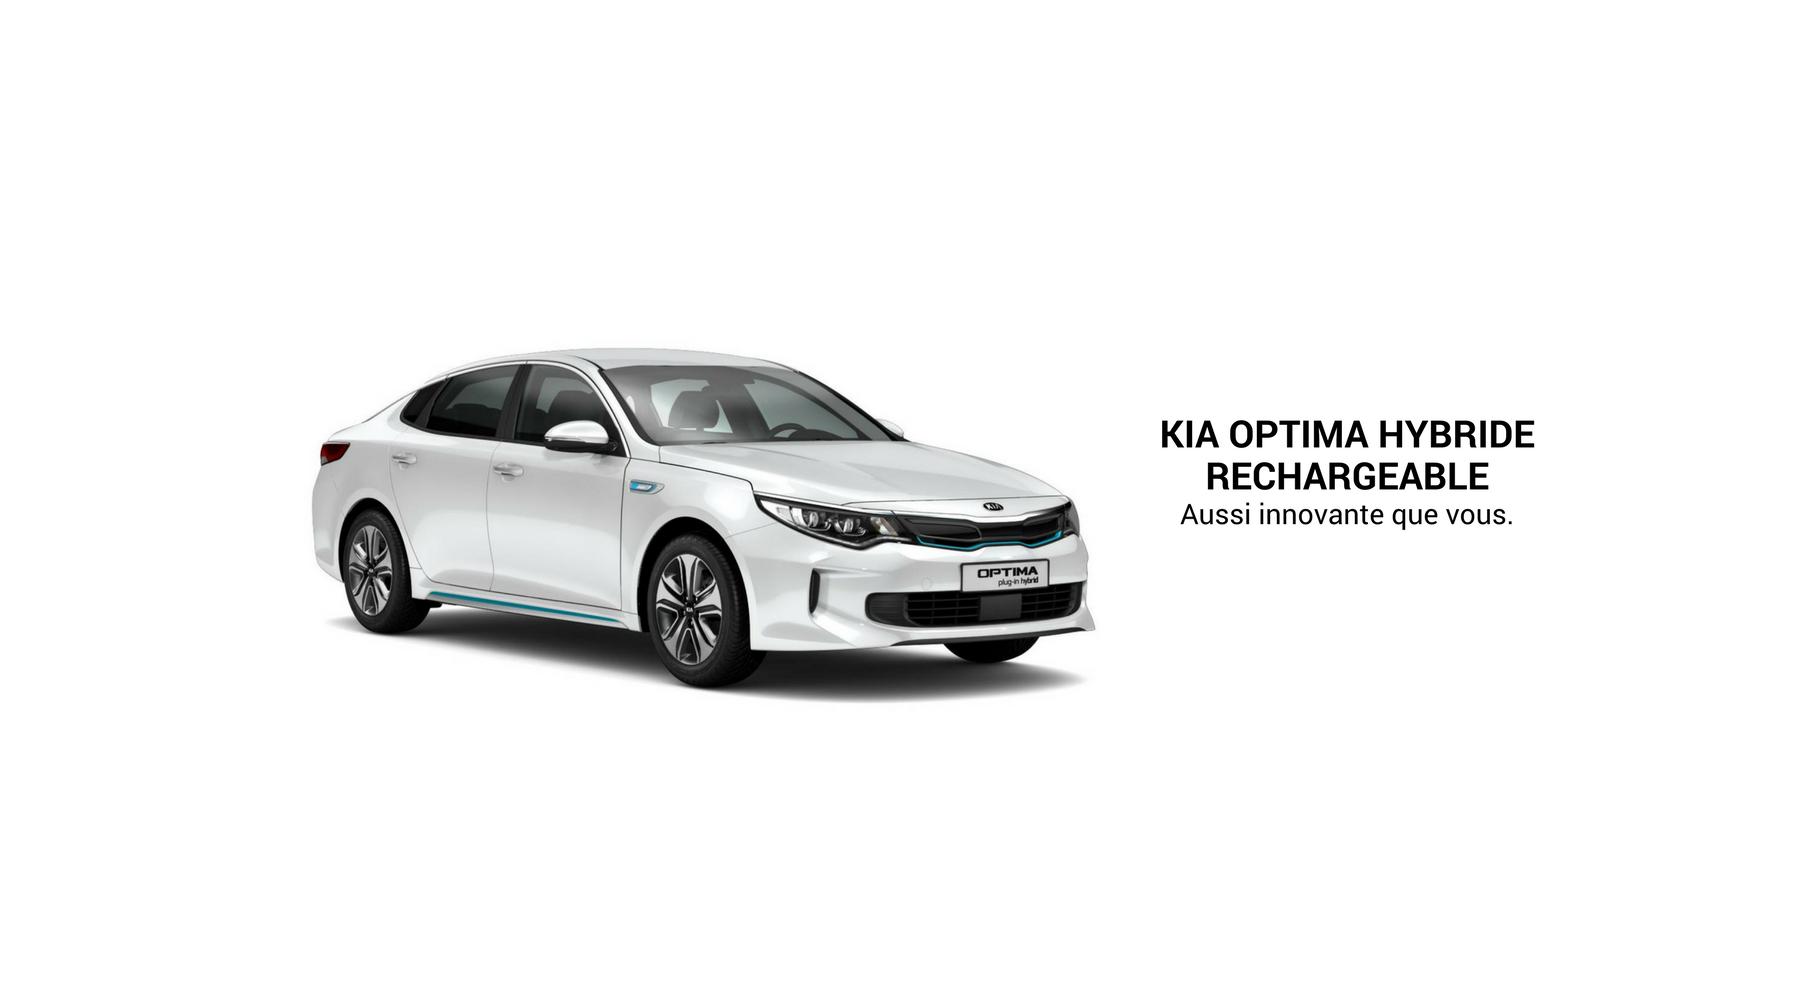 kia optima hybride rechargeable.png